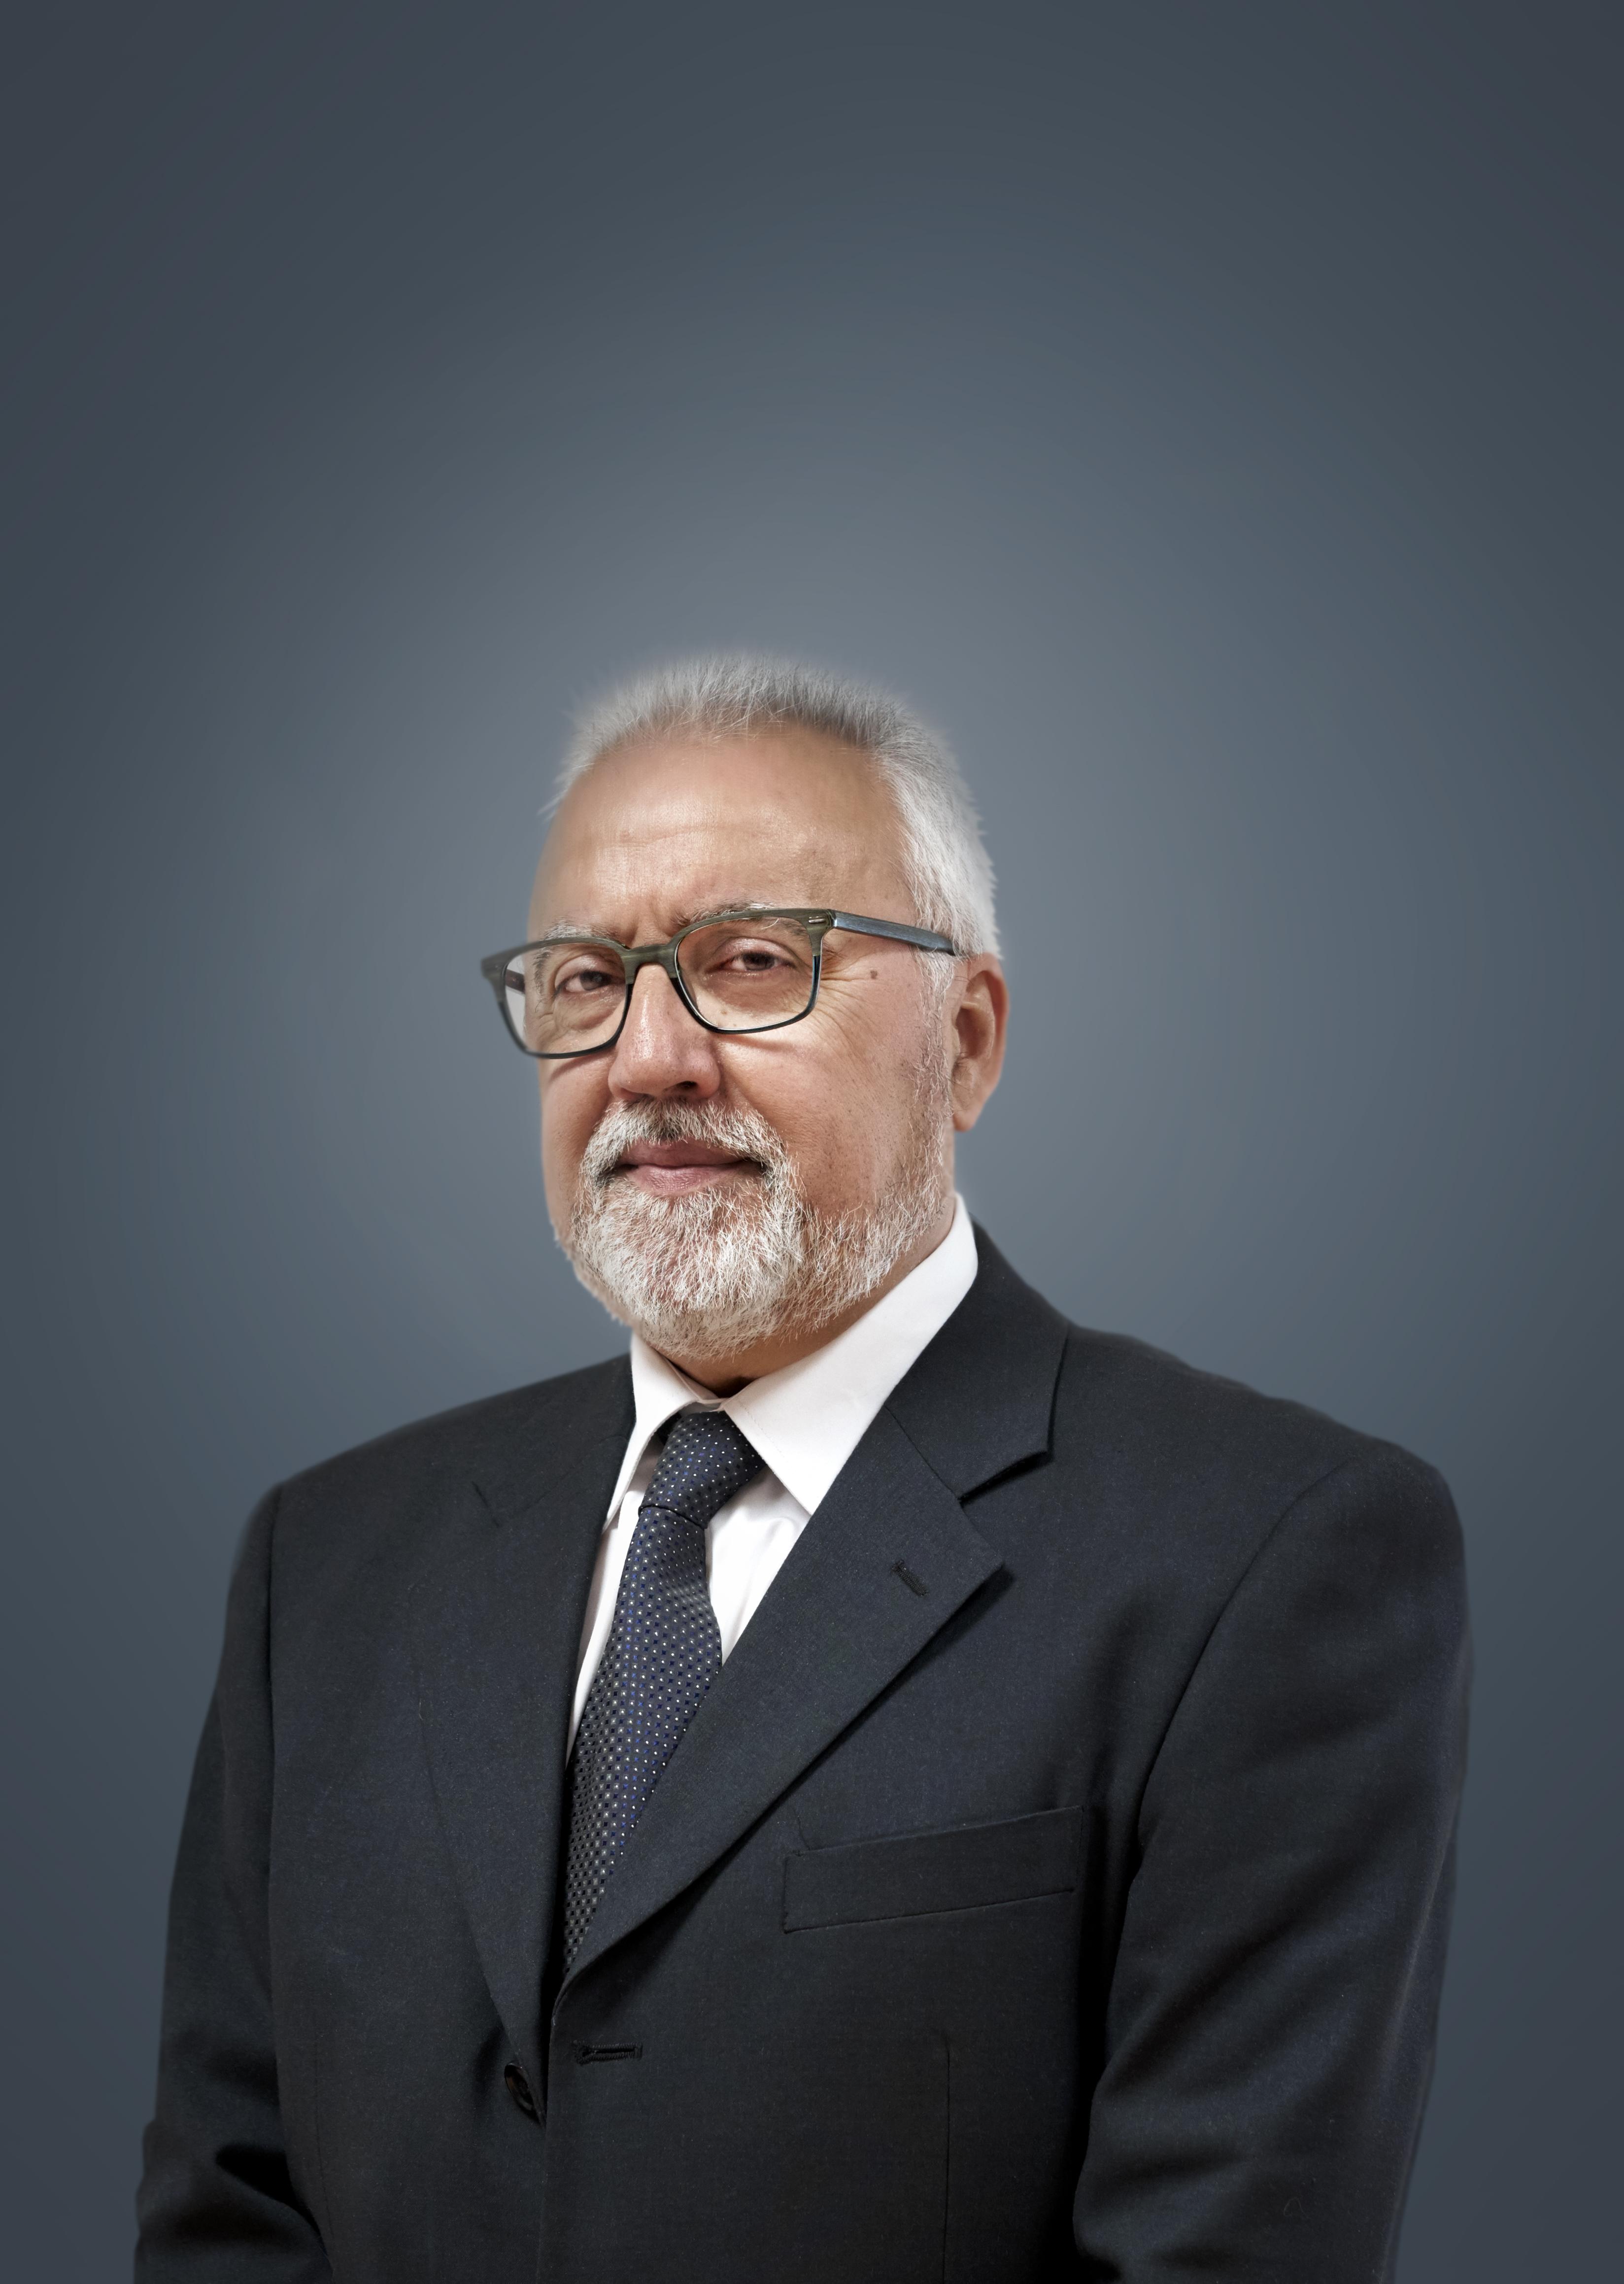 Manuel Ramiro Ferrer